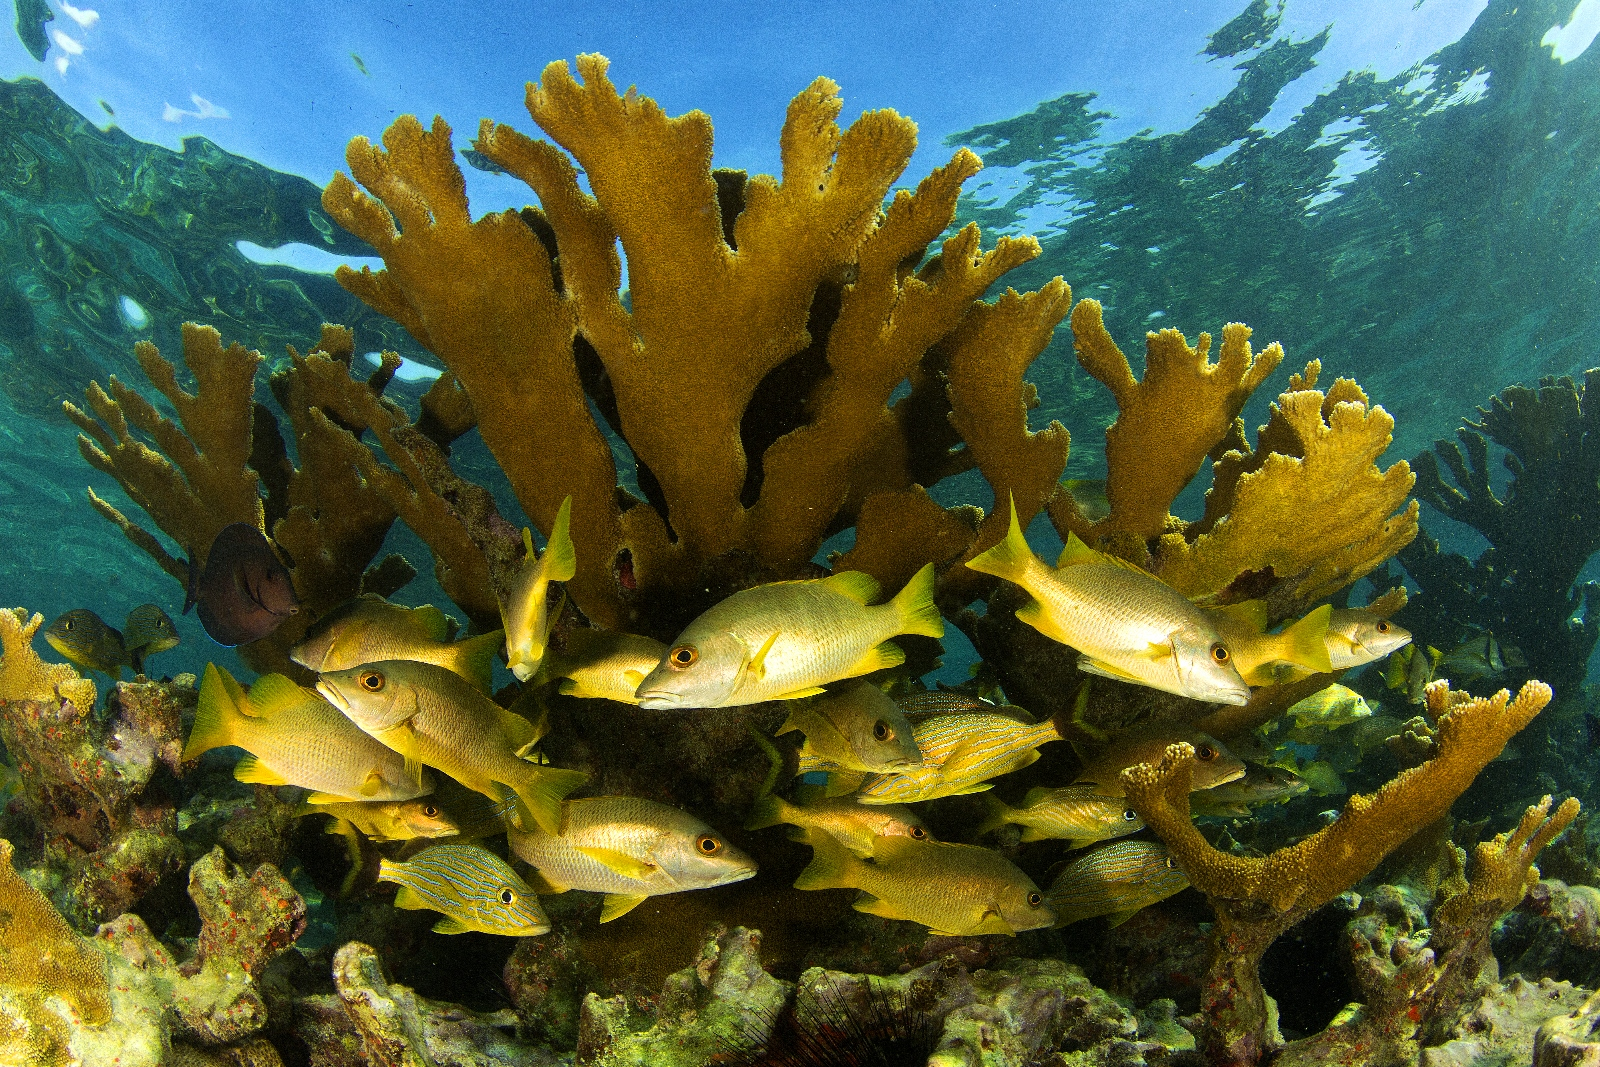 Grunts swimming under elk horn coral (Acropora palmata). Credit: Noel Lopez